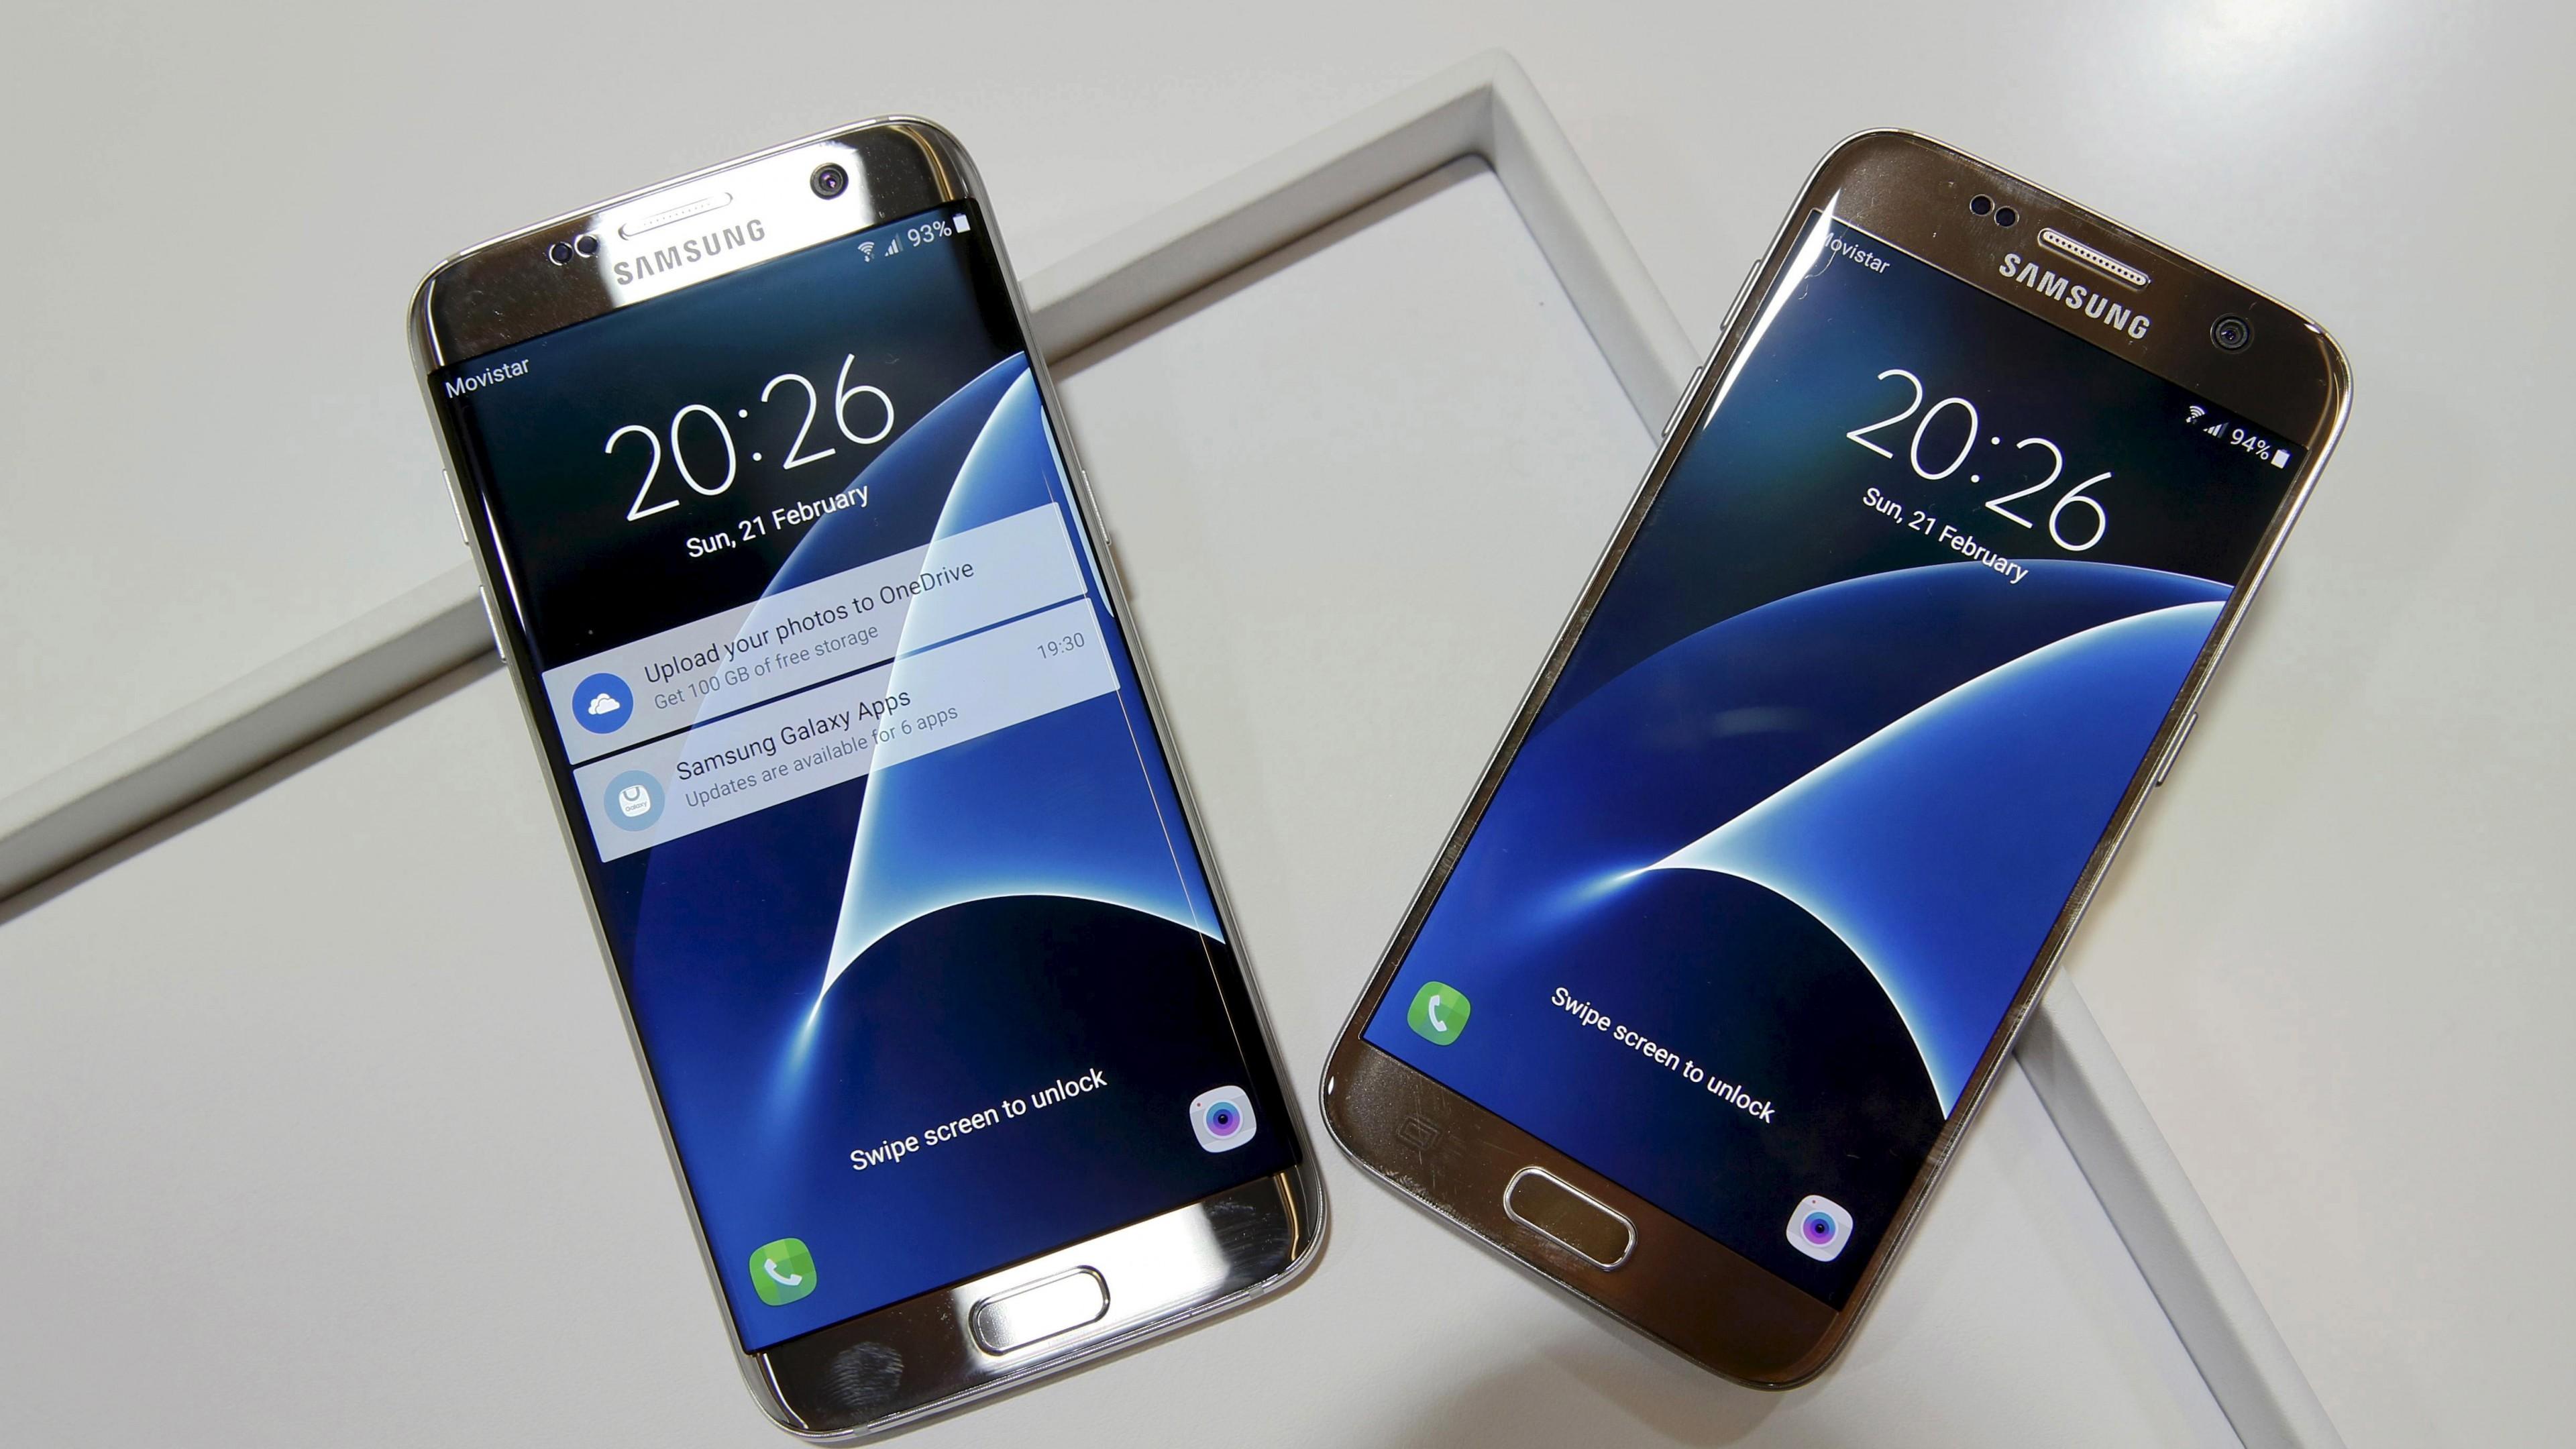 Samsung Galaxy S7 Edge 3840x2160 Download Hd Wallpaper Wallpapertip